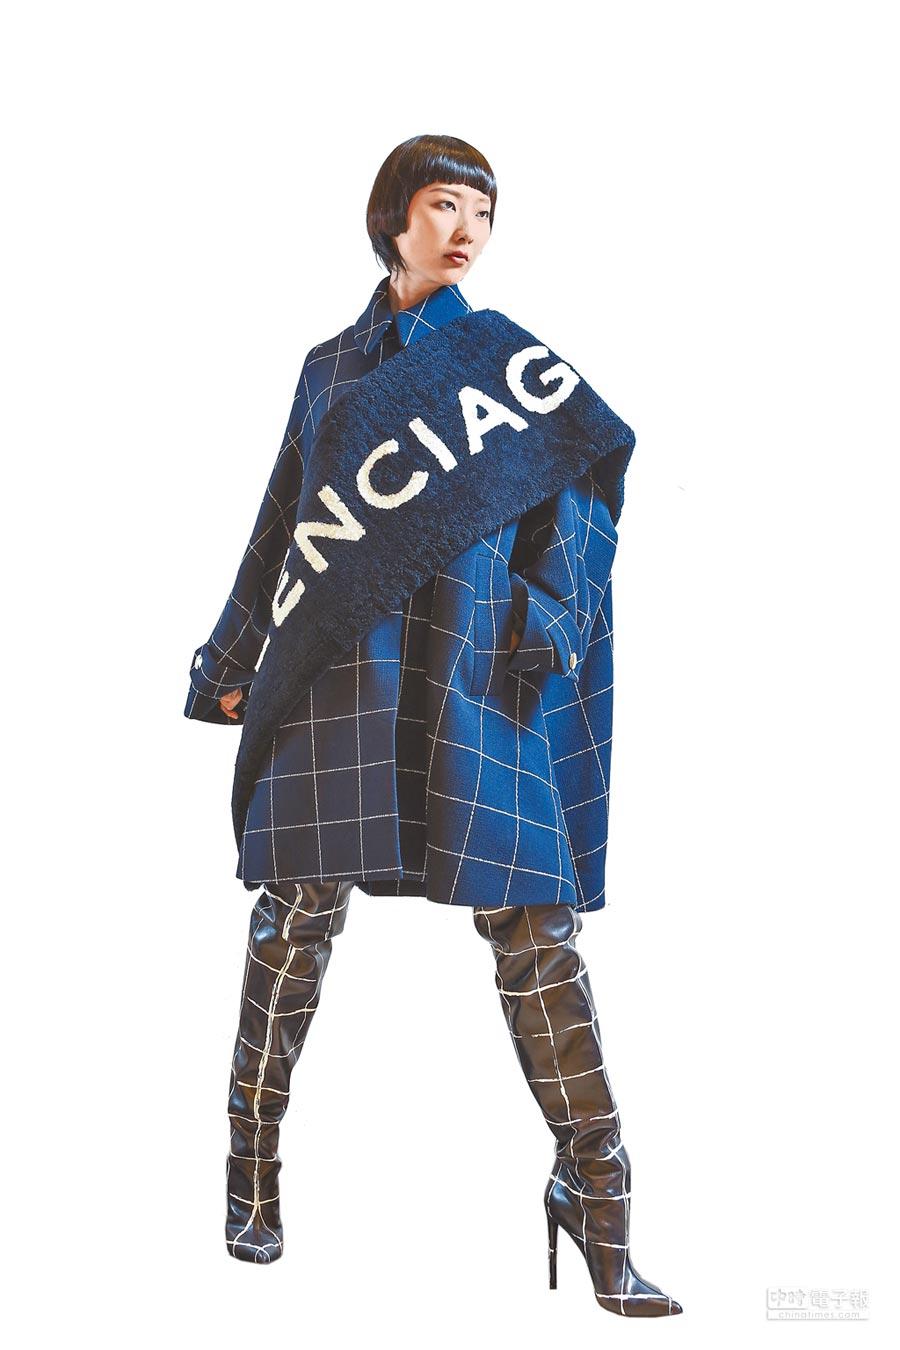 BALENCIAGA早秋將衣服標籤放大,成為羊毛圍巾,藍色格紋大衣與羊毛圍巾皆8萬5900元、格紋長靴5萬7900元。(鄧博仁攝)